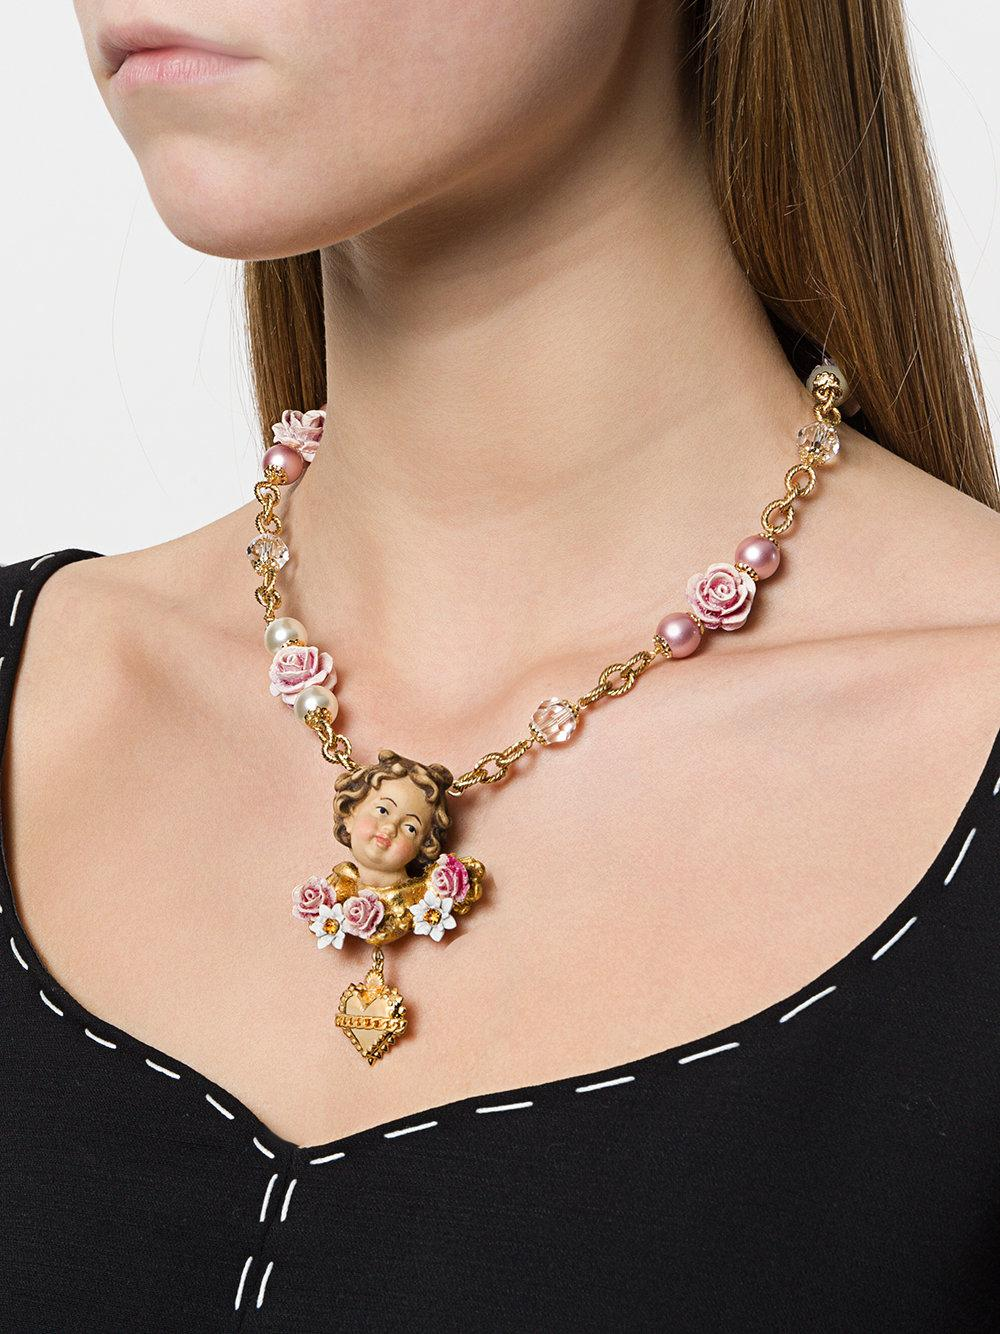 Dolce & Gabbana Cherub Rose Necklace